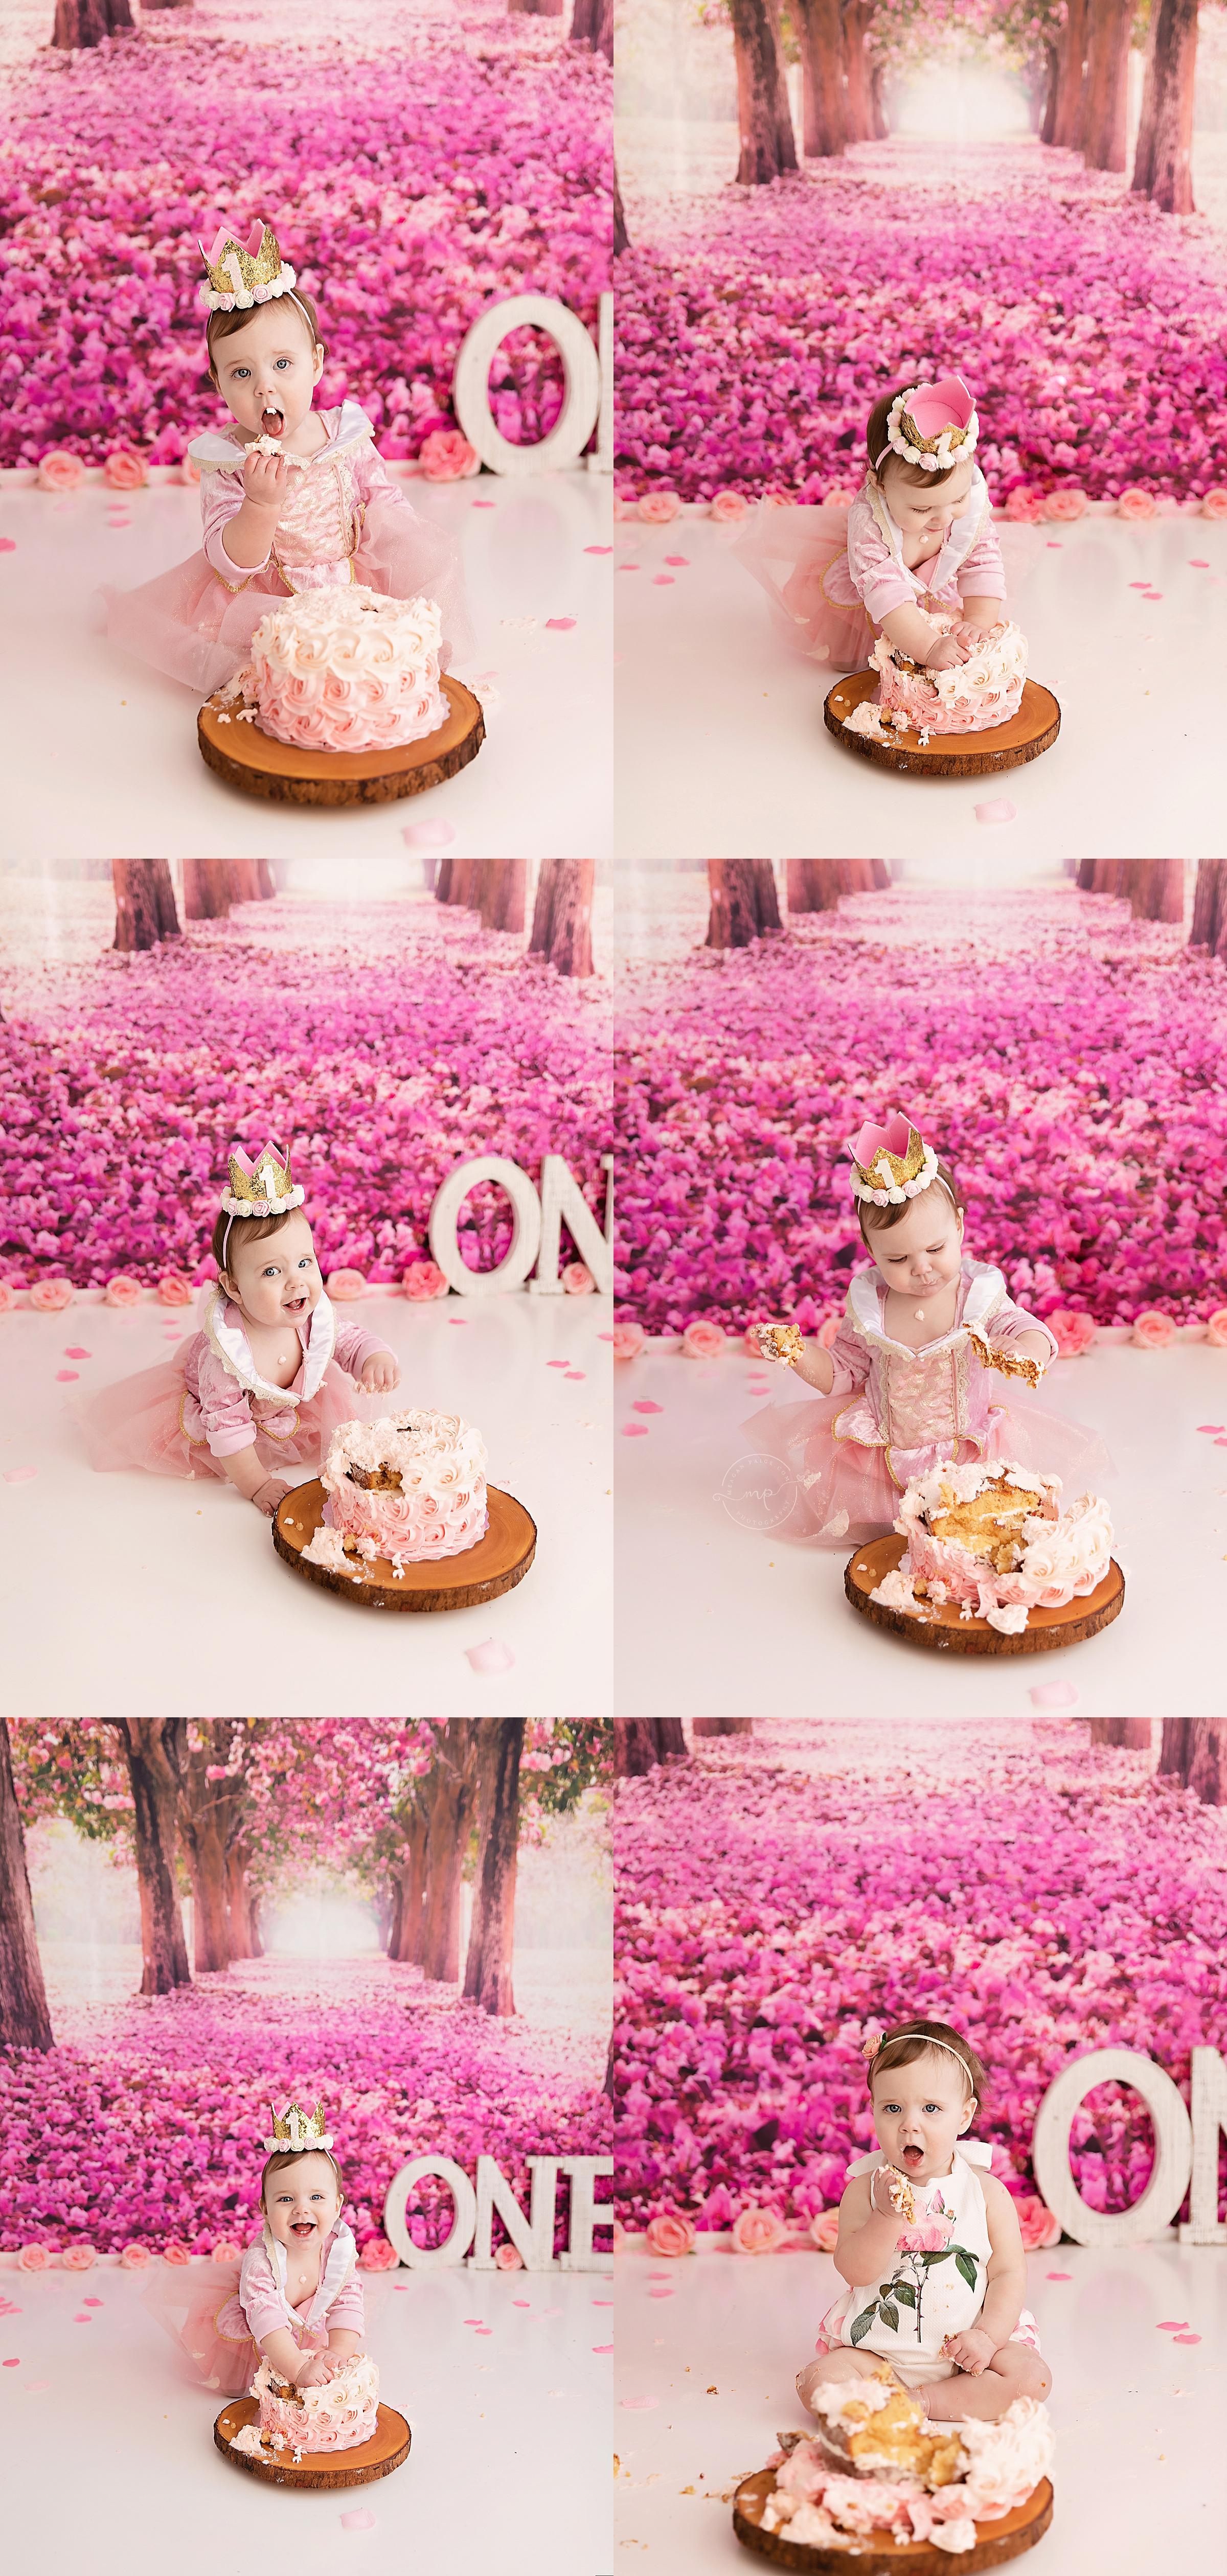 Aurora Rose Cake Smash - Calgary Photographer - Meagan Paige Photography